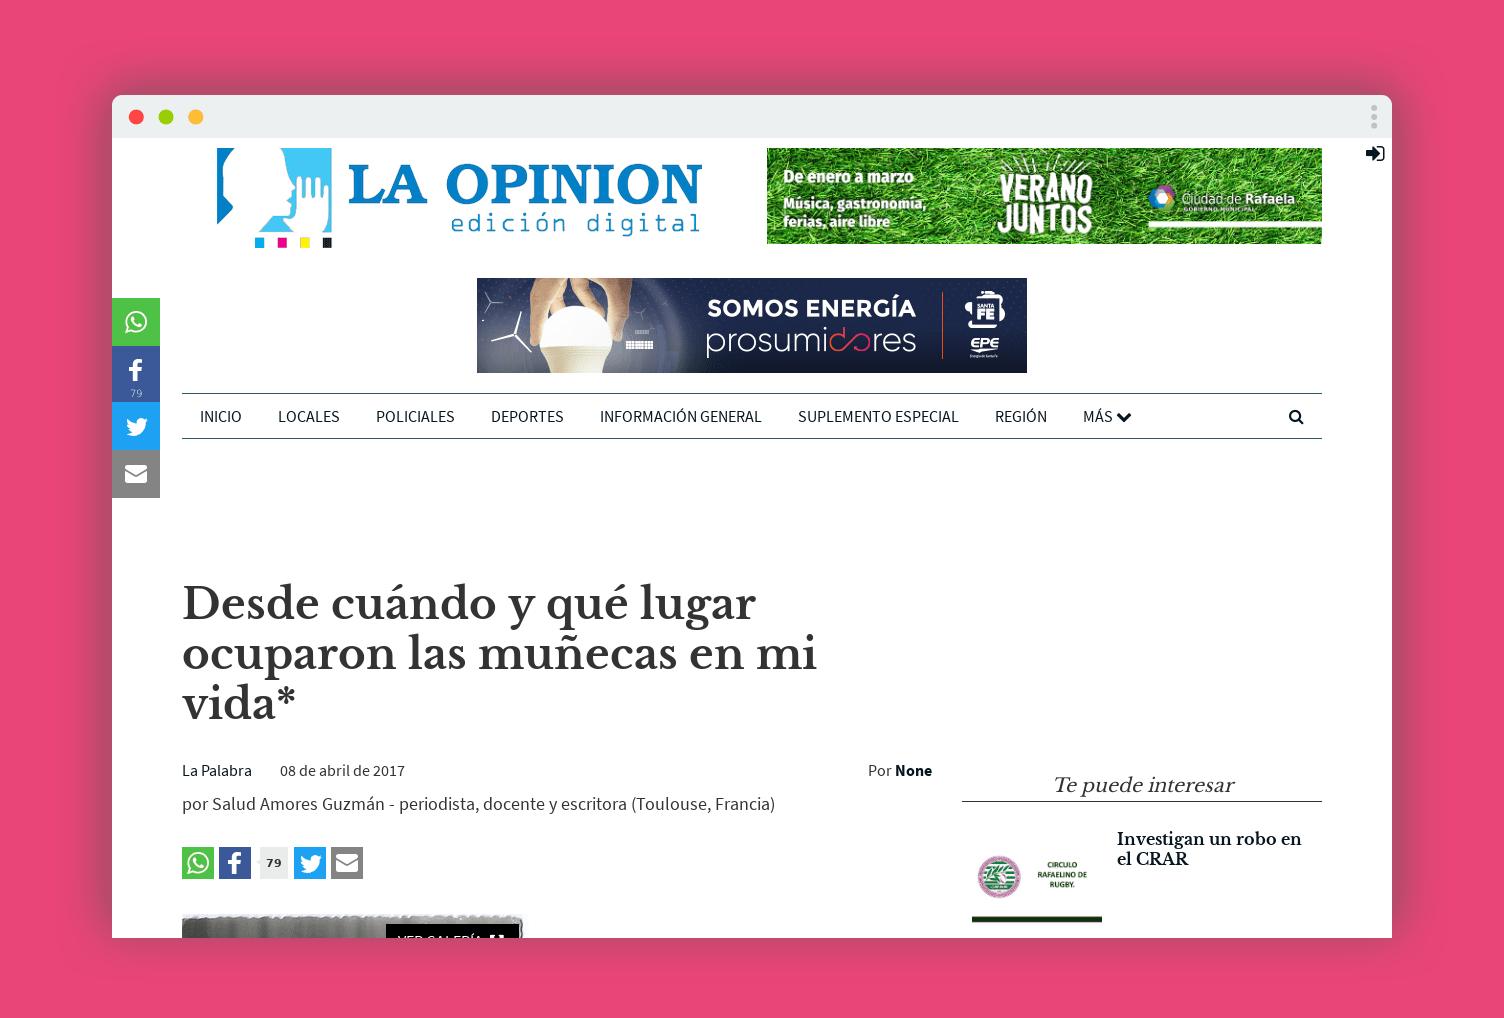 la-opinion-salud-amores-bombon-2